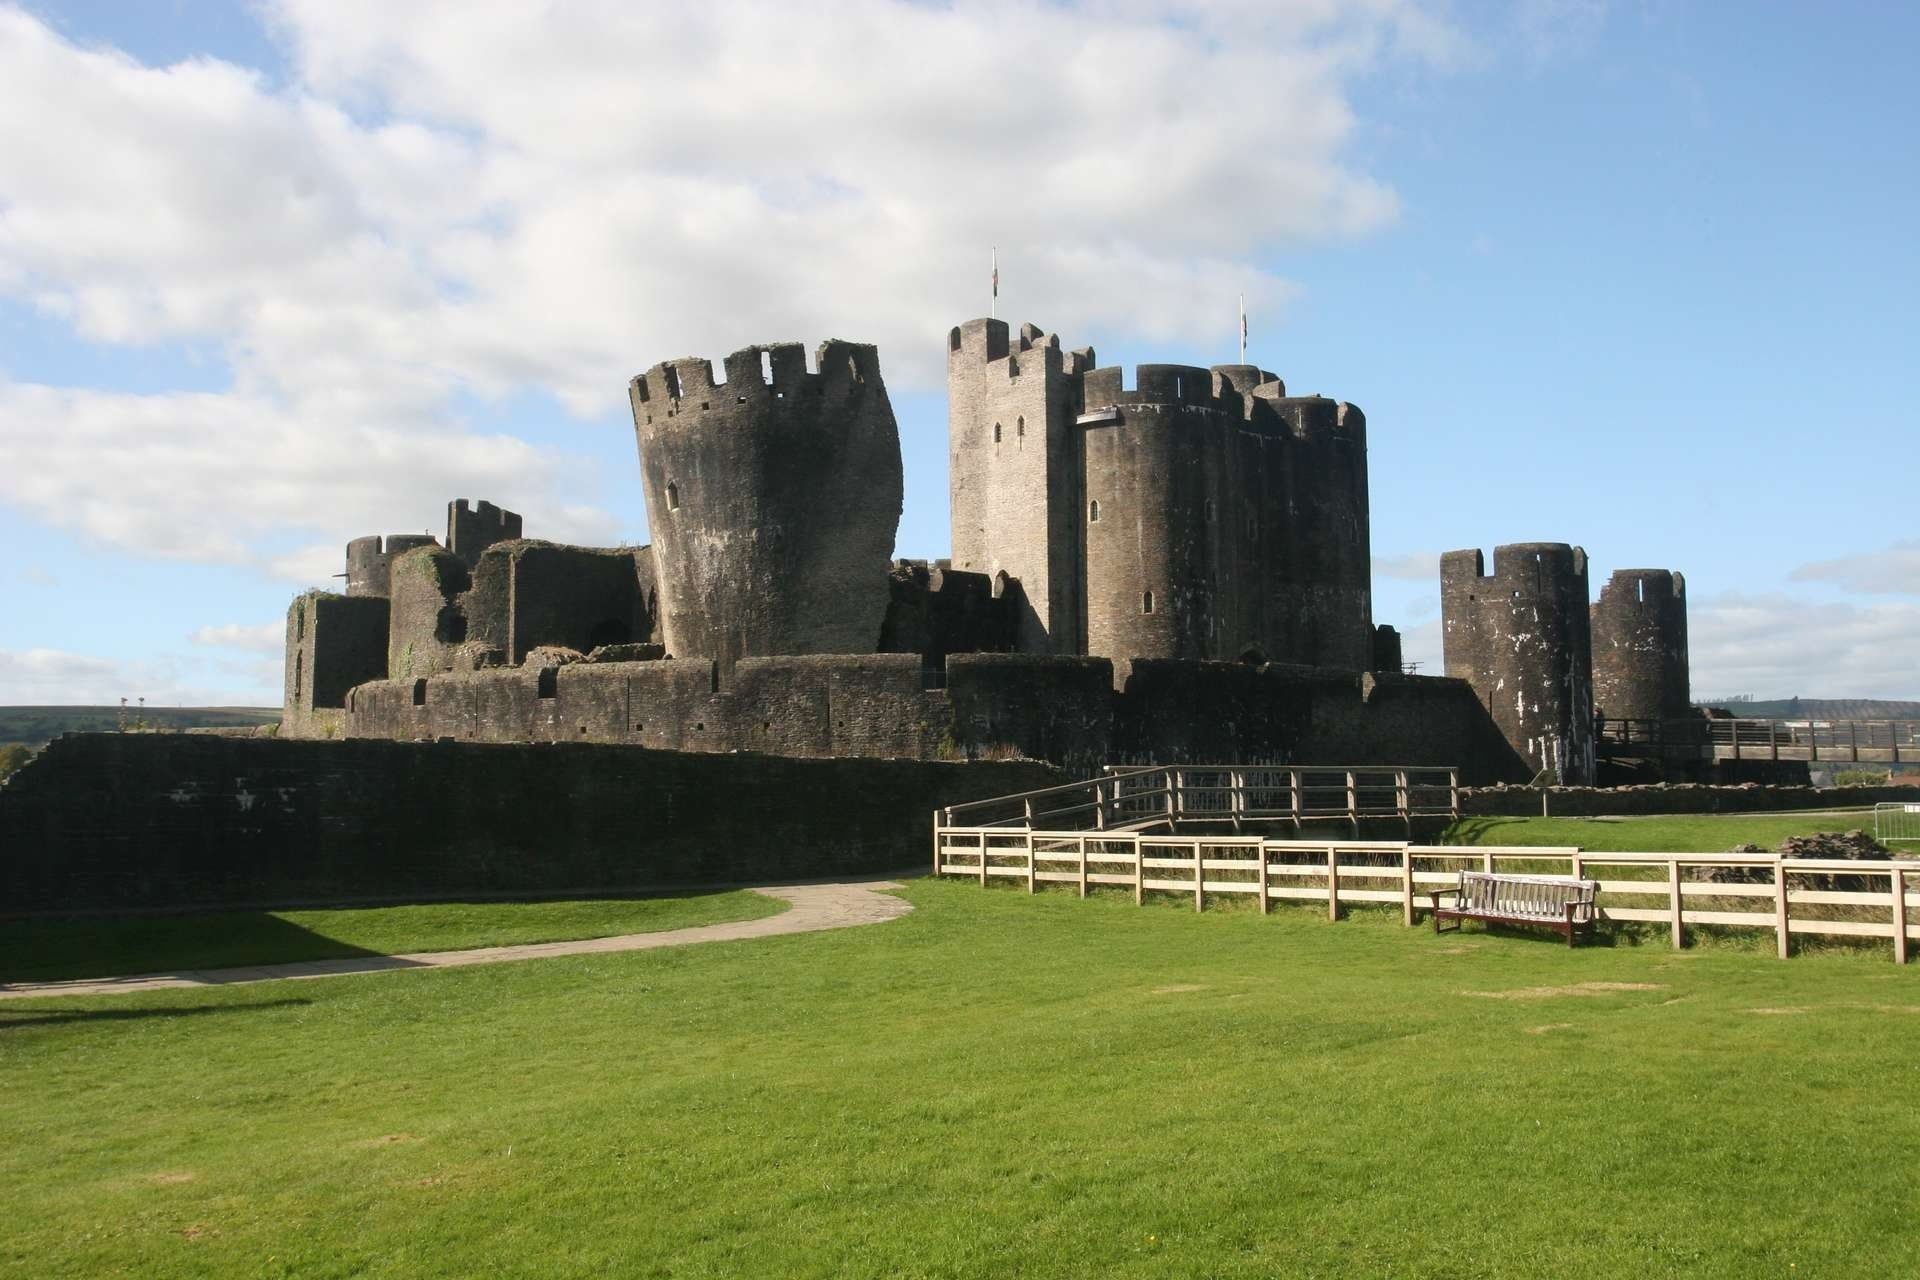 महल, Torres, किले, पुराने, मध्ययुगीन, caerphilly - HD वॉलपेपर - प्रोफेसर-falken.com